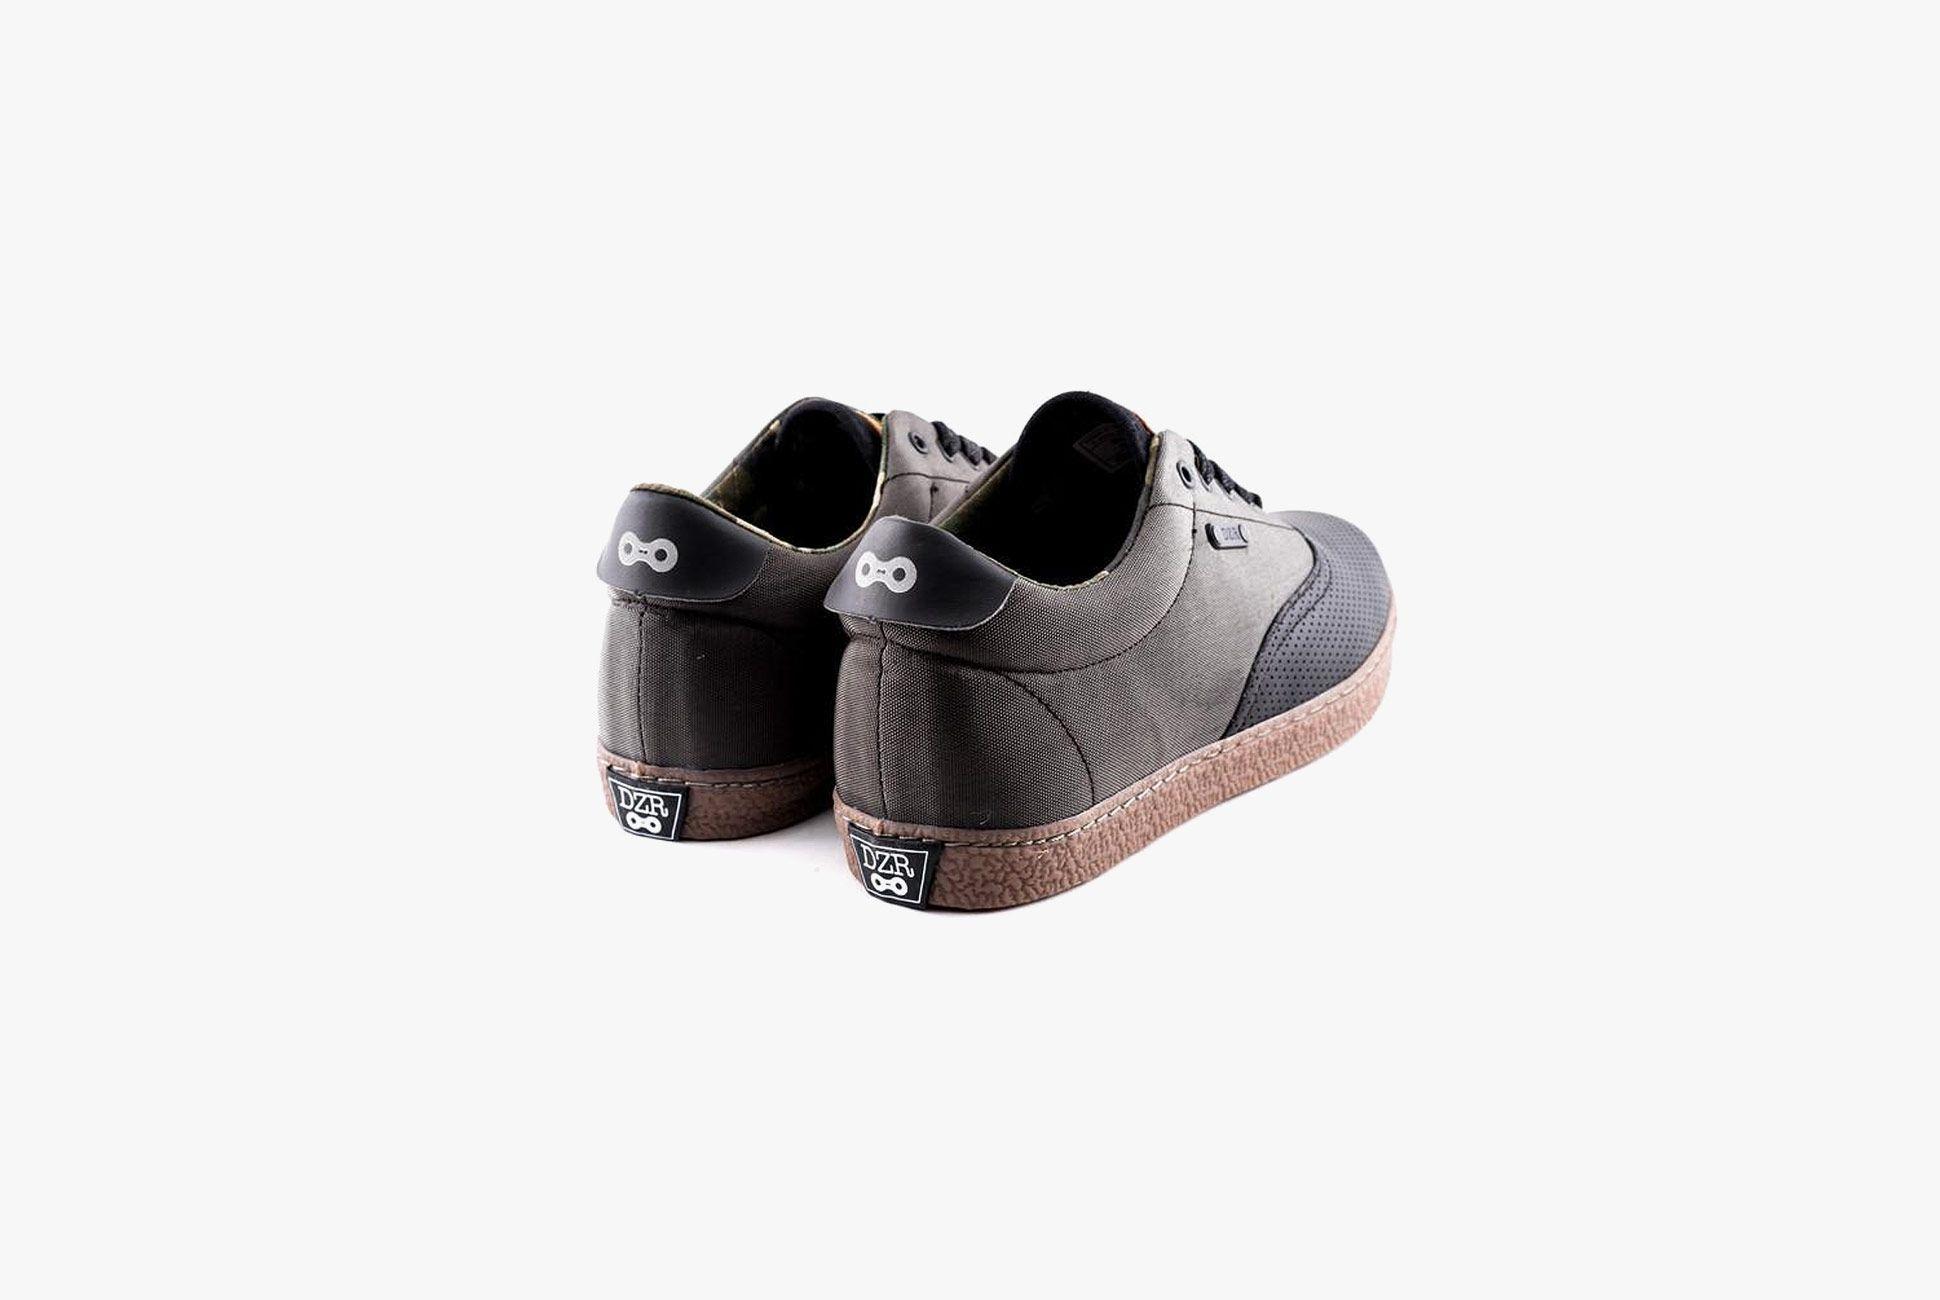 DZR-Shoes-gear-patrol-8